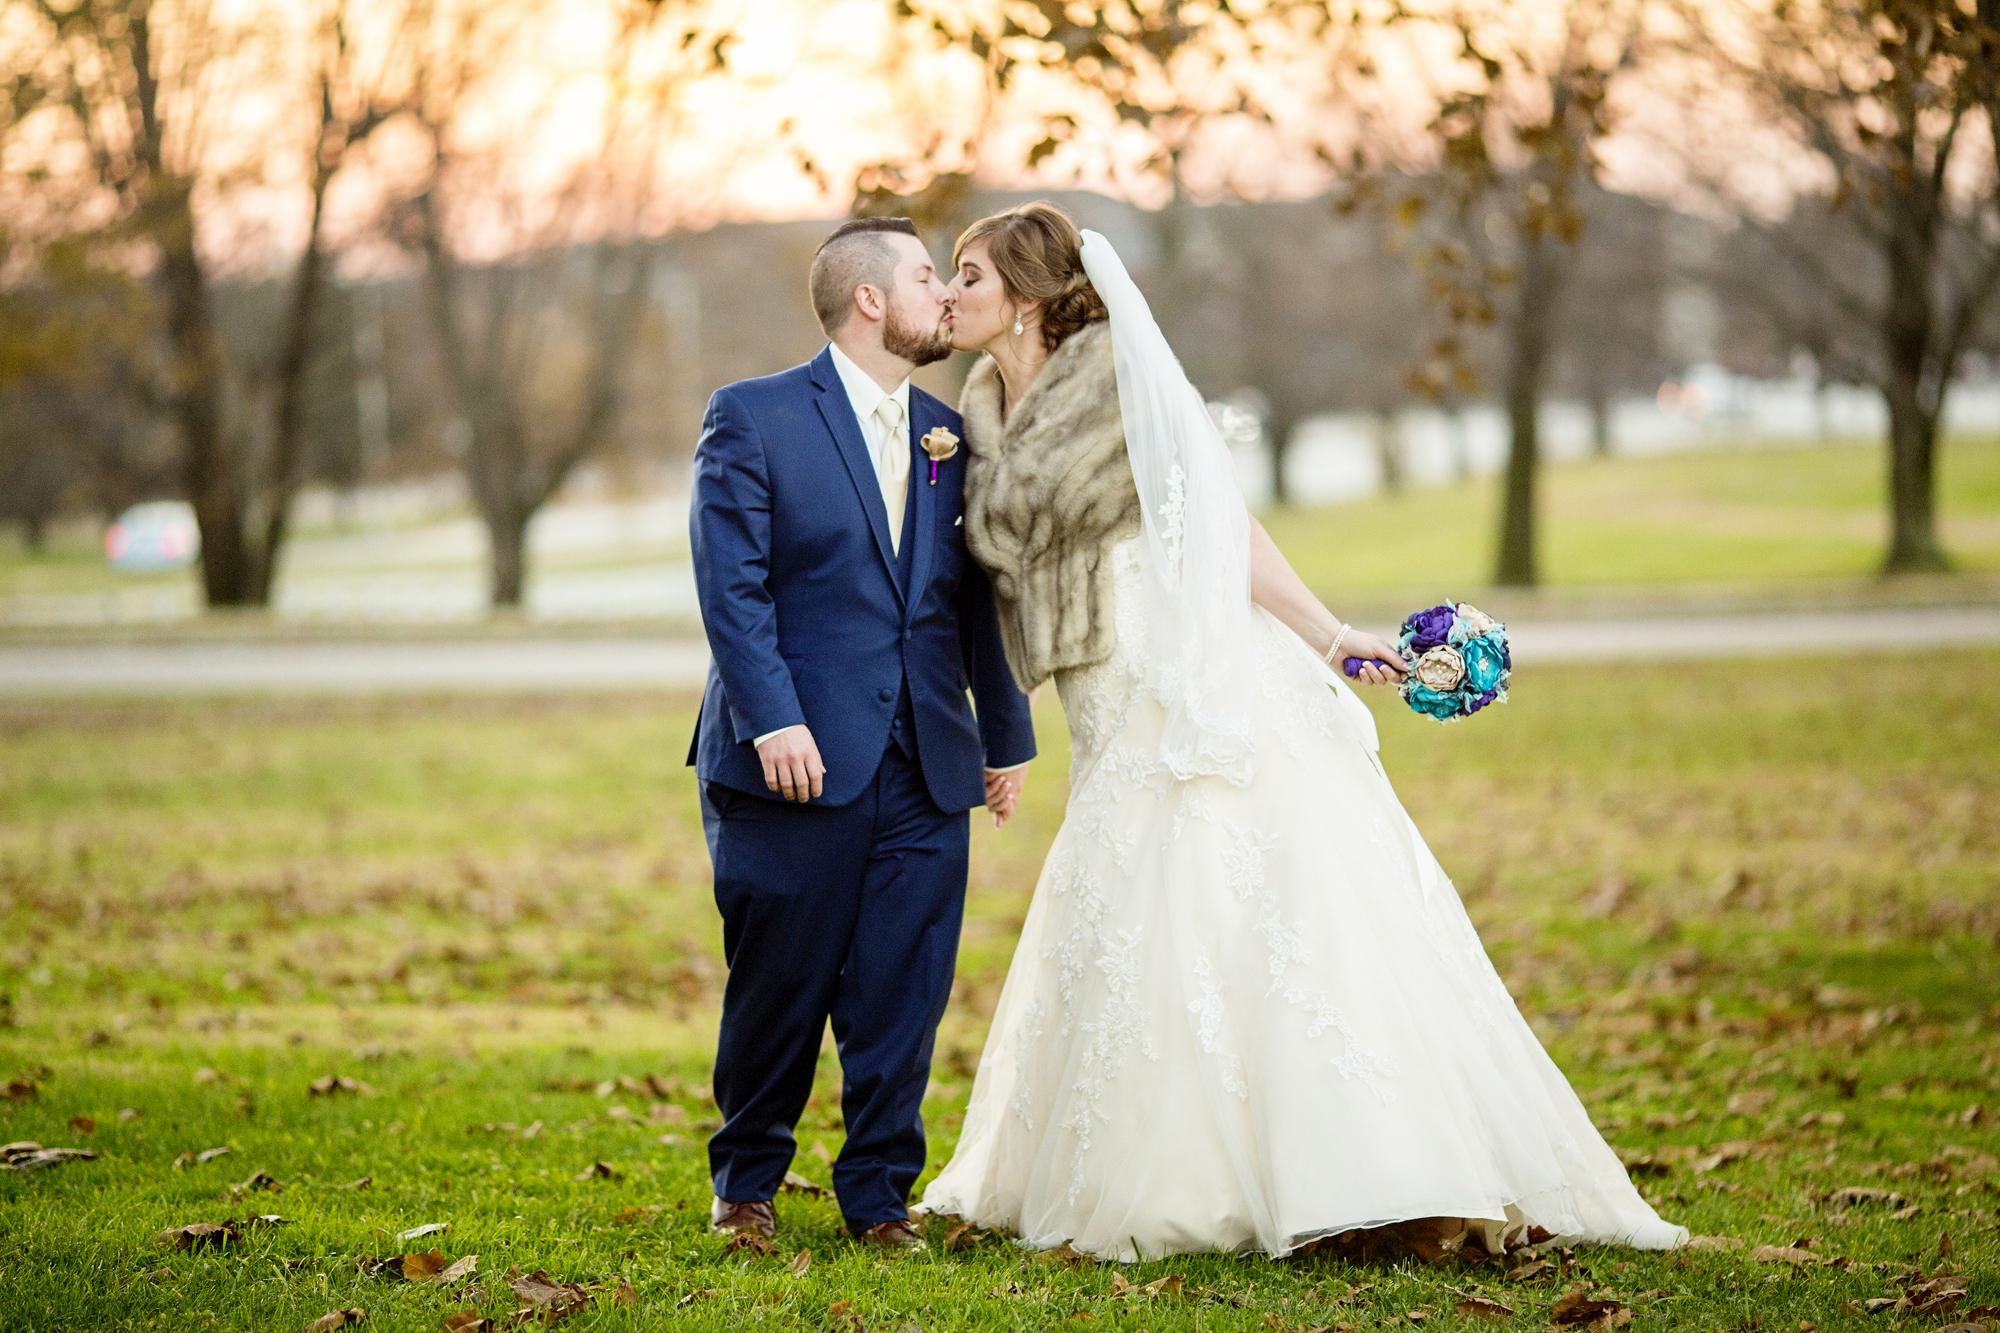 Seriously_Sabrina_Photography_Lexington_Kentucky_21c_Round_Barn_Red_Mile_Wedding_Gorley_49.jpg